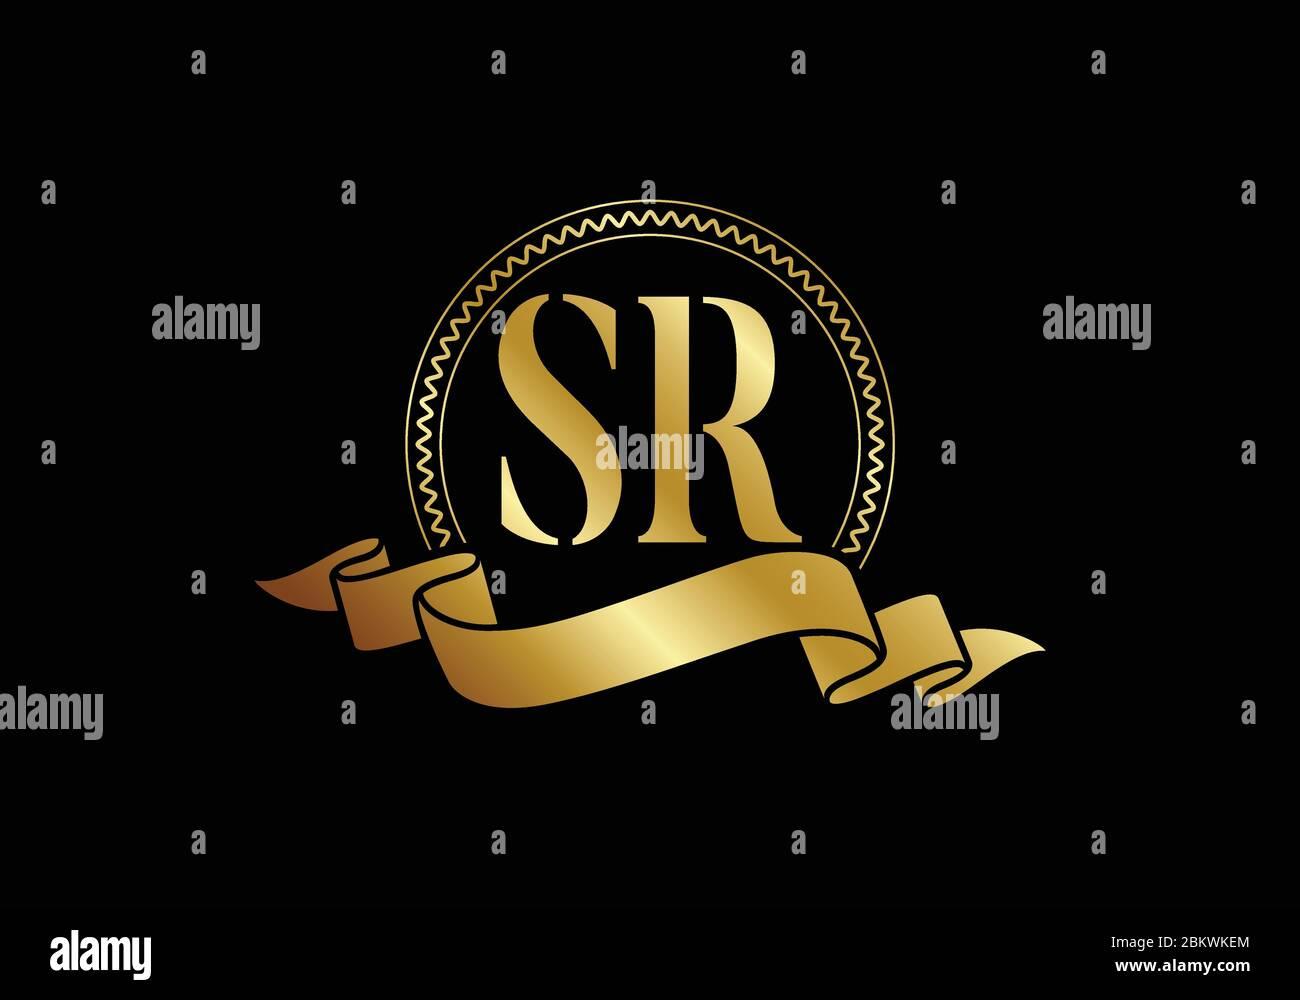 Initial Monogram Letter Sr Logo Design Vector Template Graphic Alphabet Symbol For Corporate Business Identity Stock Vector Image Art Alamy